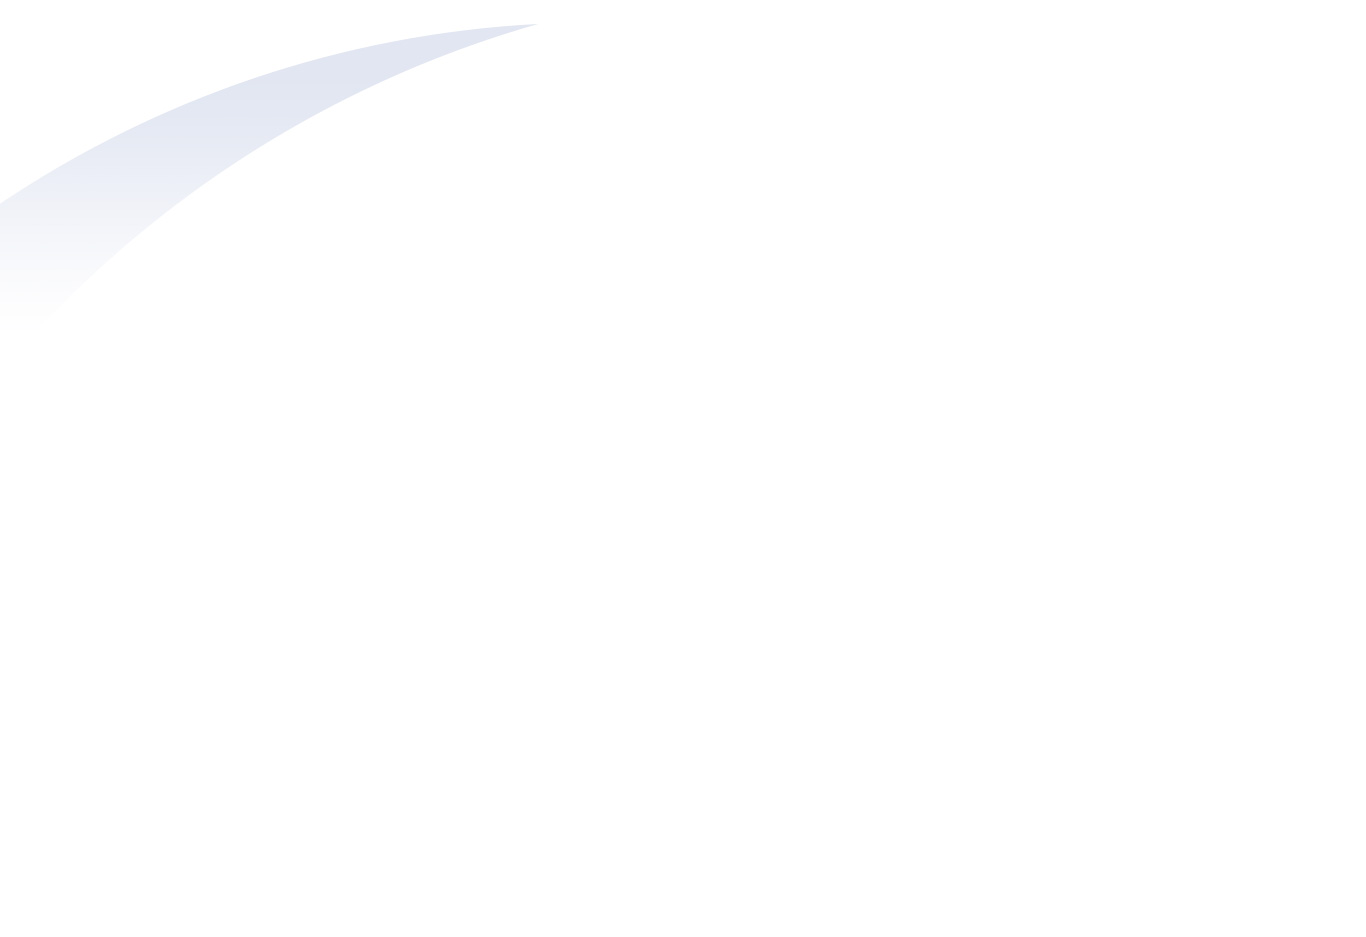 Probate court althea caces llc probate elder law estate althea c caces esq attorney at law 240 cherokee st suite 301 marietta georgia 30060 p 770 424 9141 f 770 424 9081 acacescaceslaw solutioingenieria Image collections